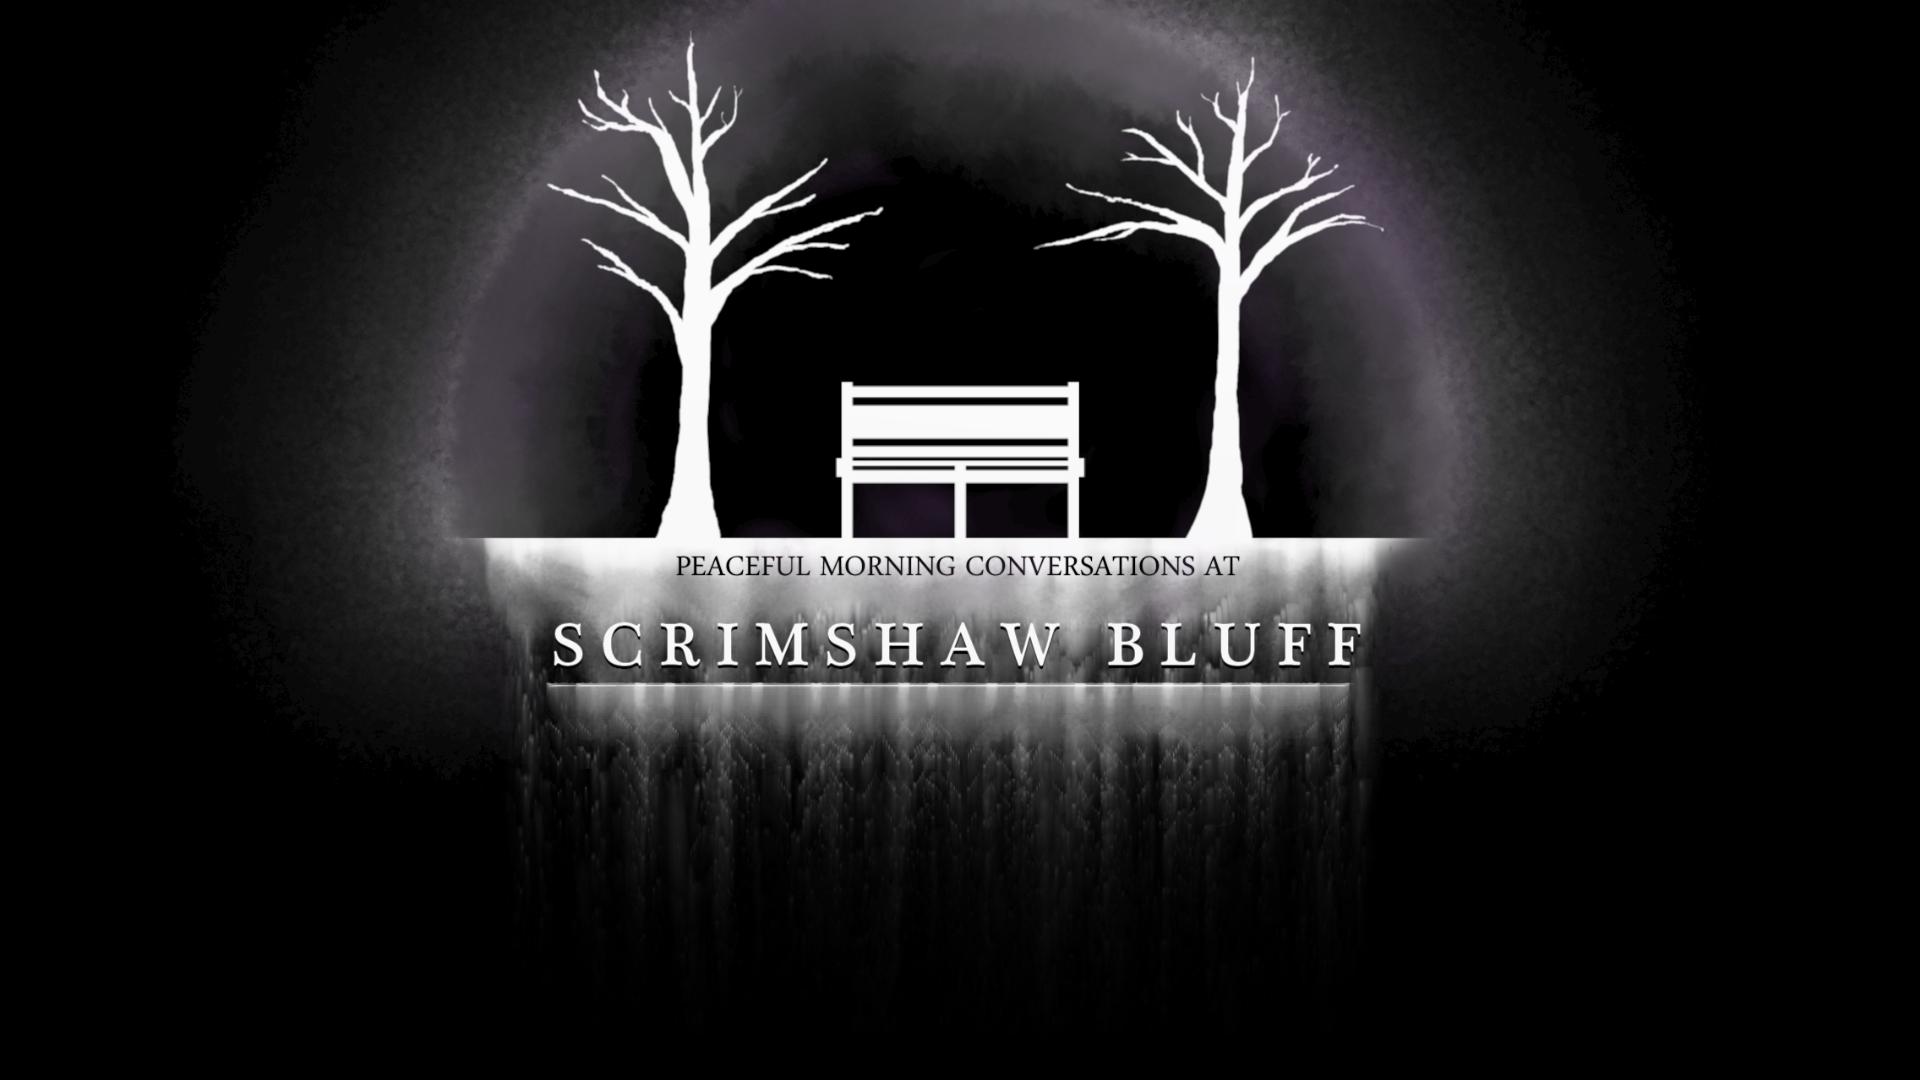 Scrimshaw Bluff (Demo v0.1)